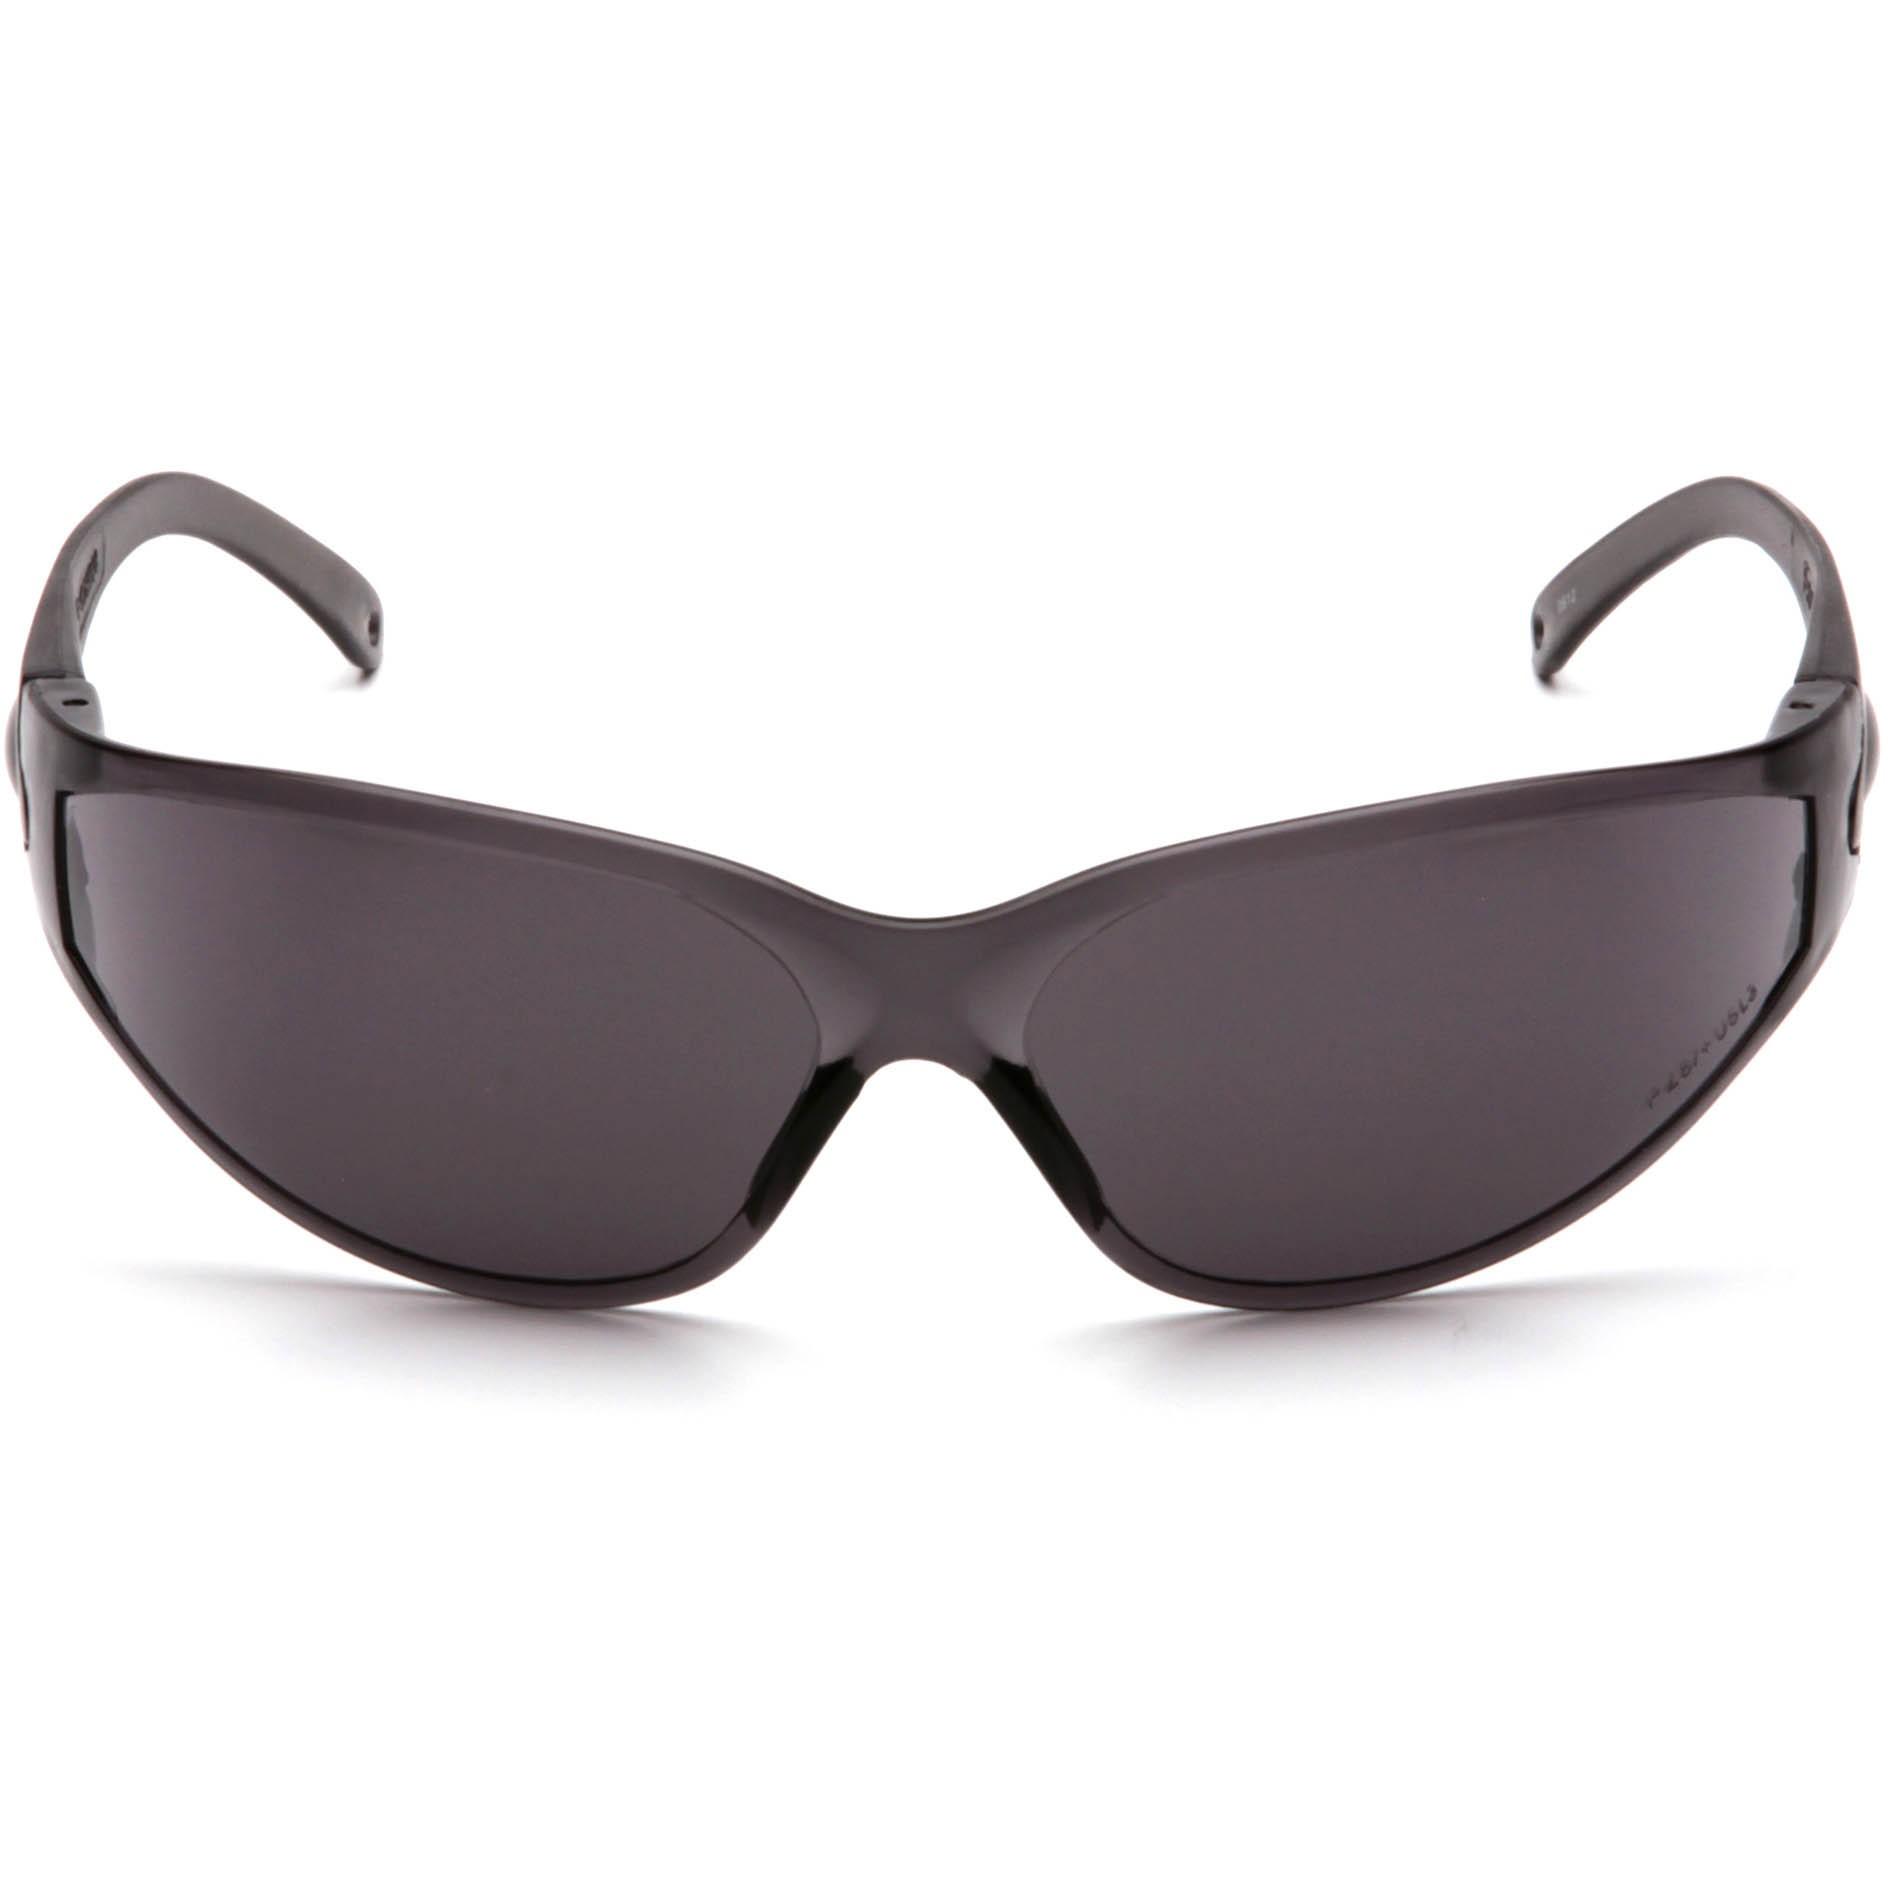 Glasses Gray Frame : Pyramex Fastrac Safety Glasses - Gray Frame - Gray Lens ...